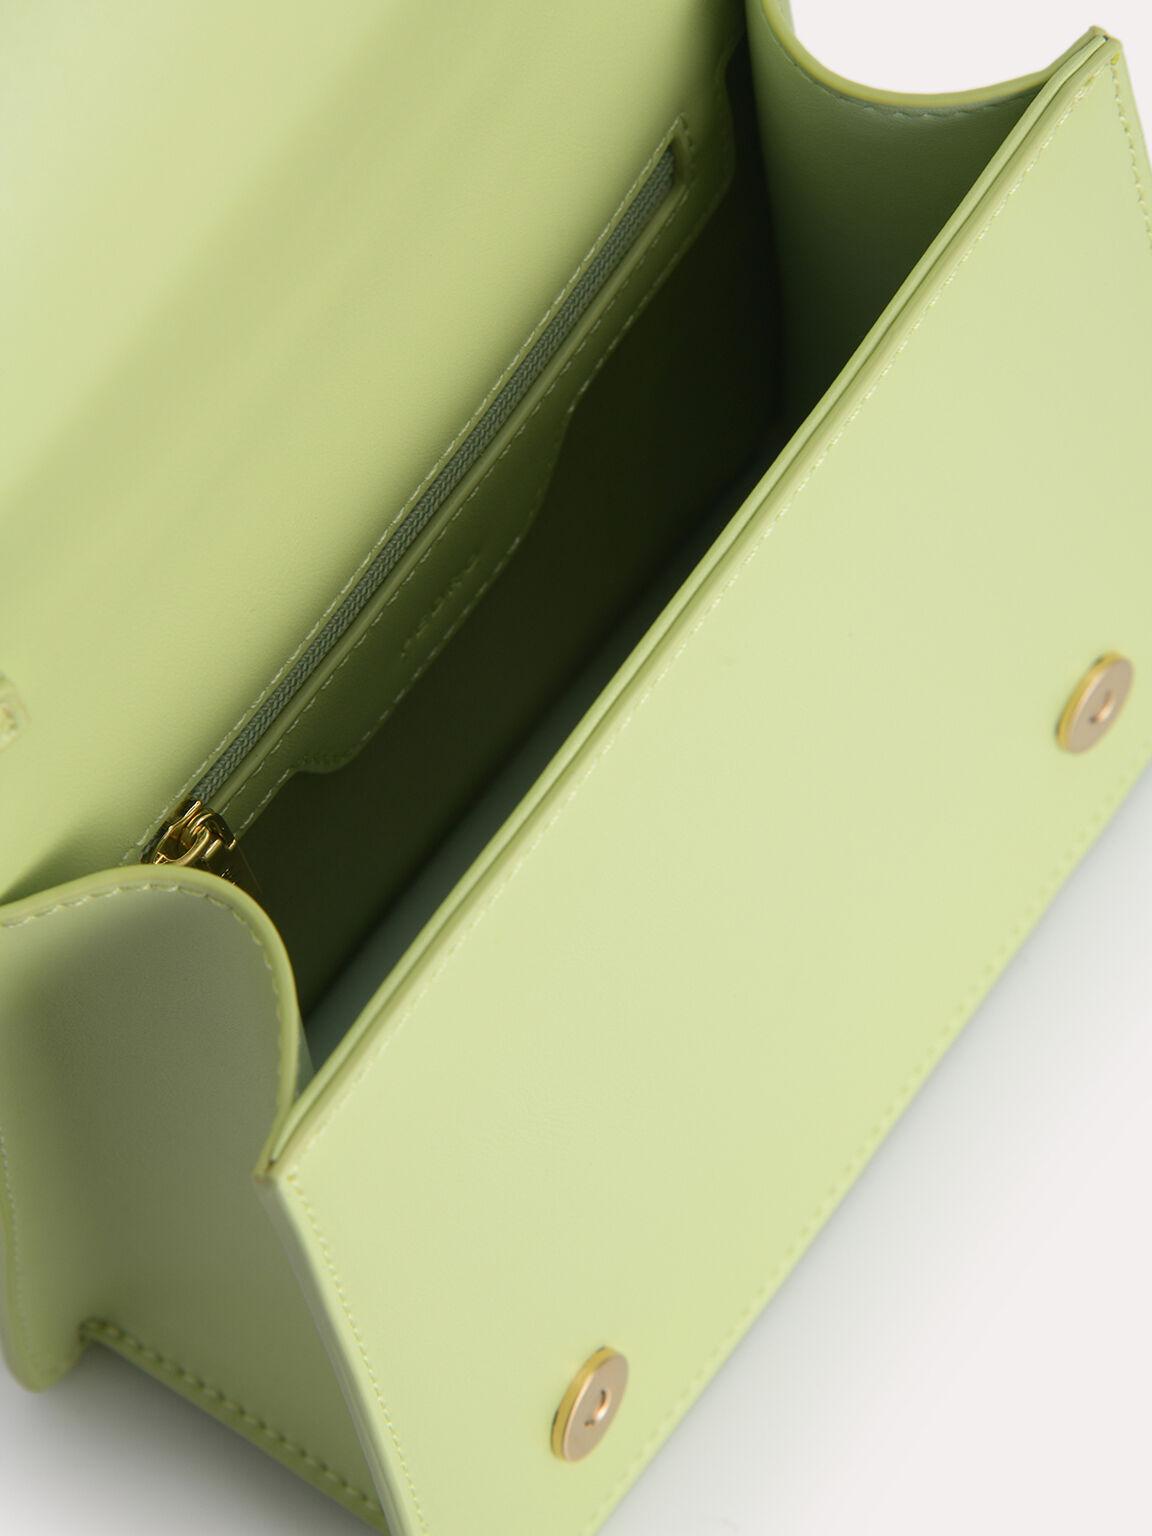 Top Handle Bag with Acrylic Handle, Light Green, hi-res